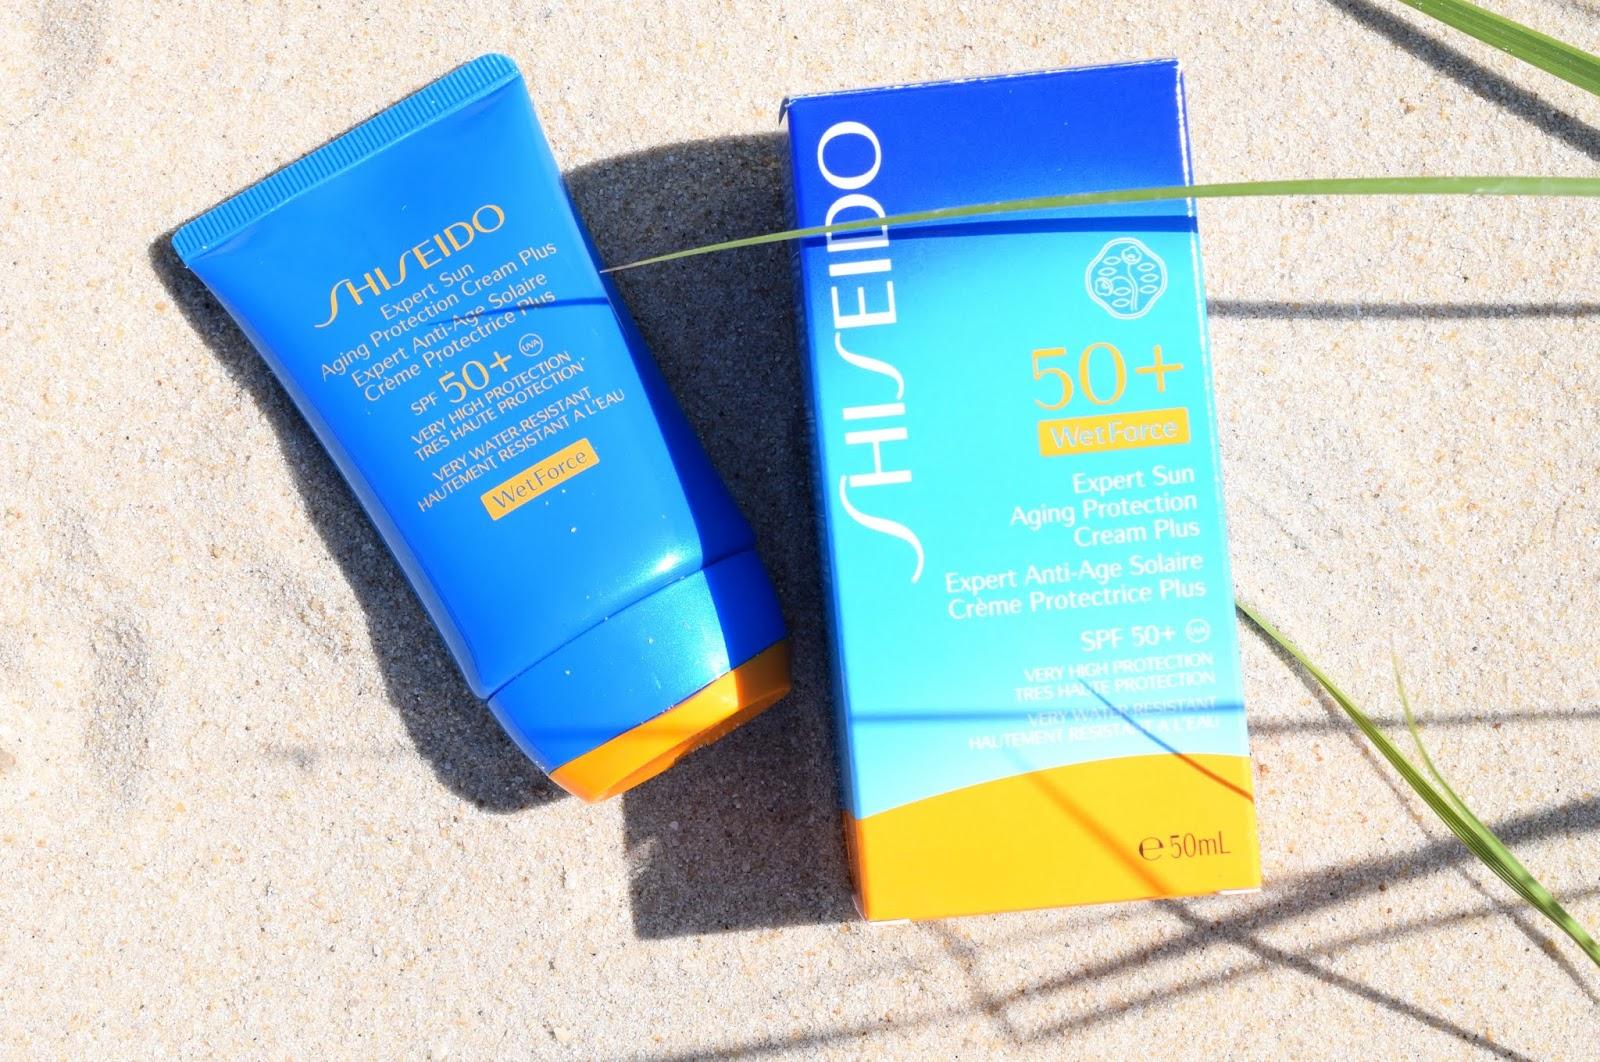 Shiseido Expert Sun Aging Protection Cream SPF50+